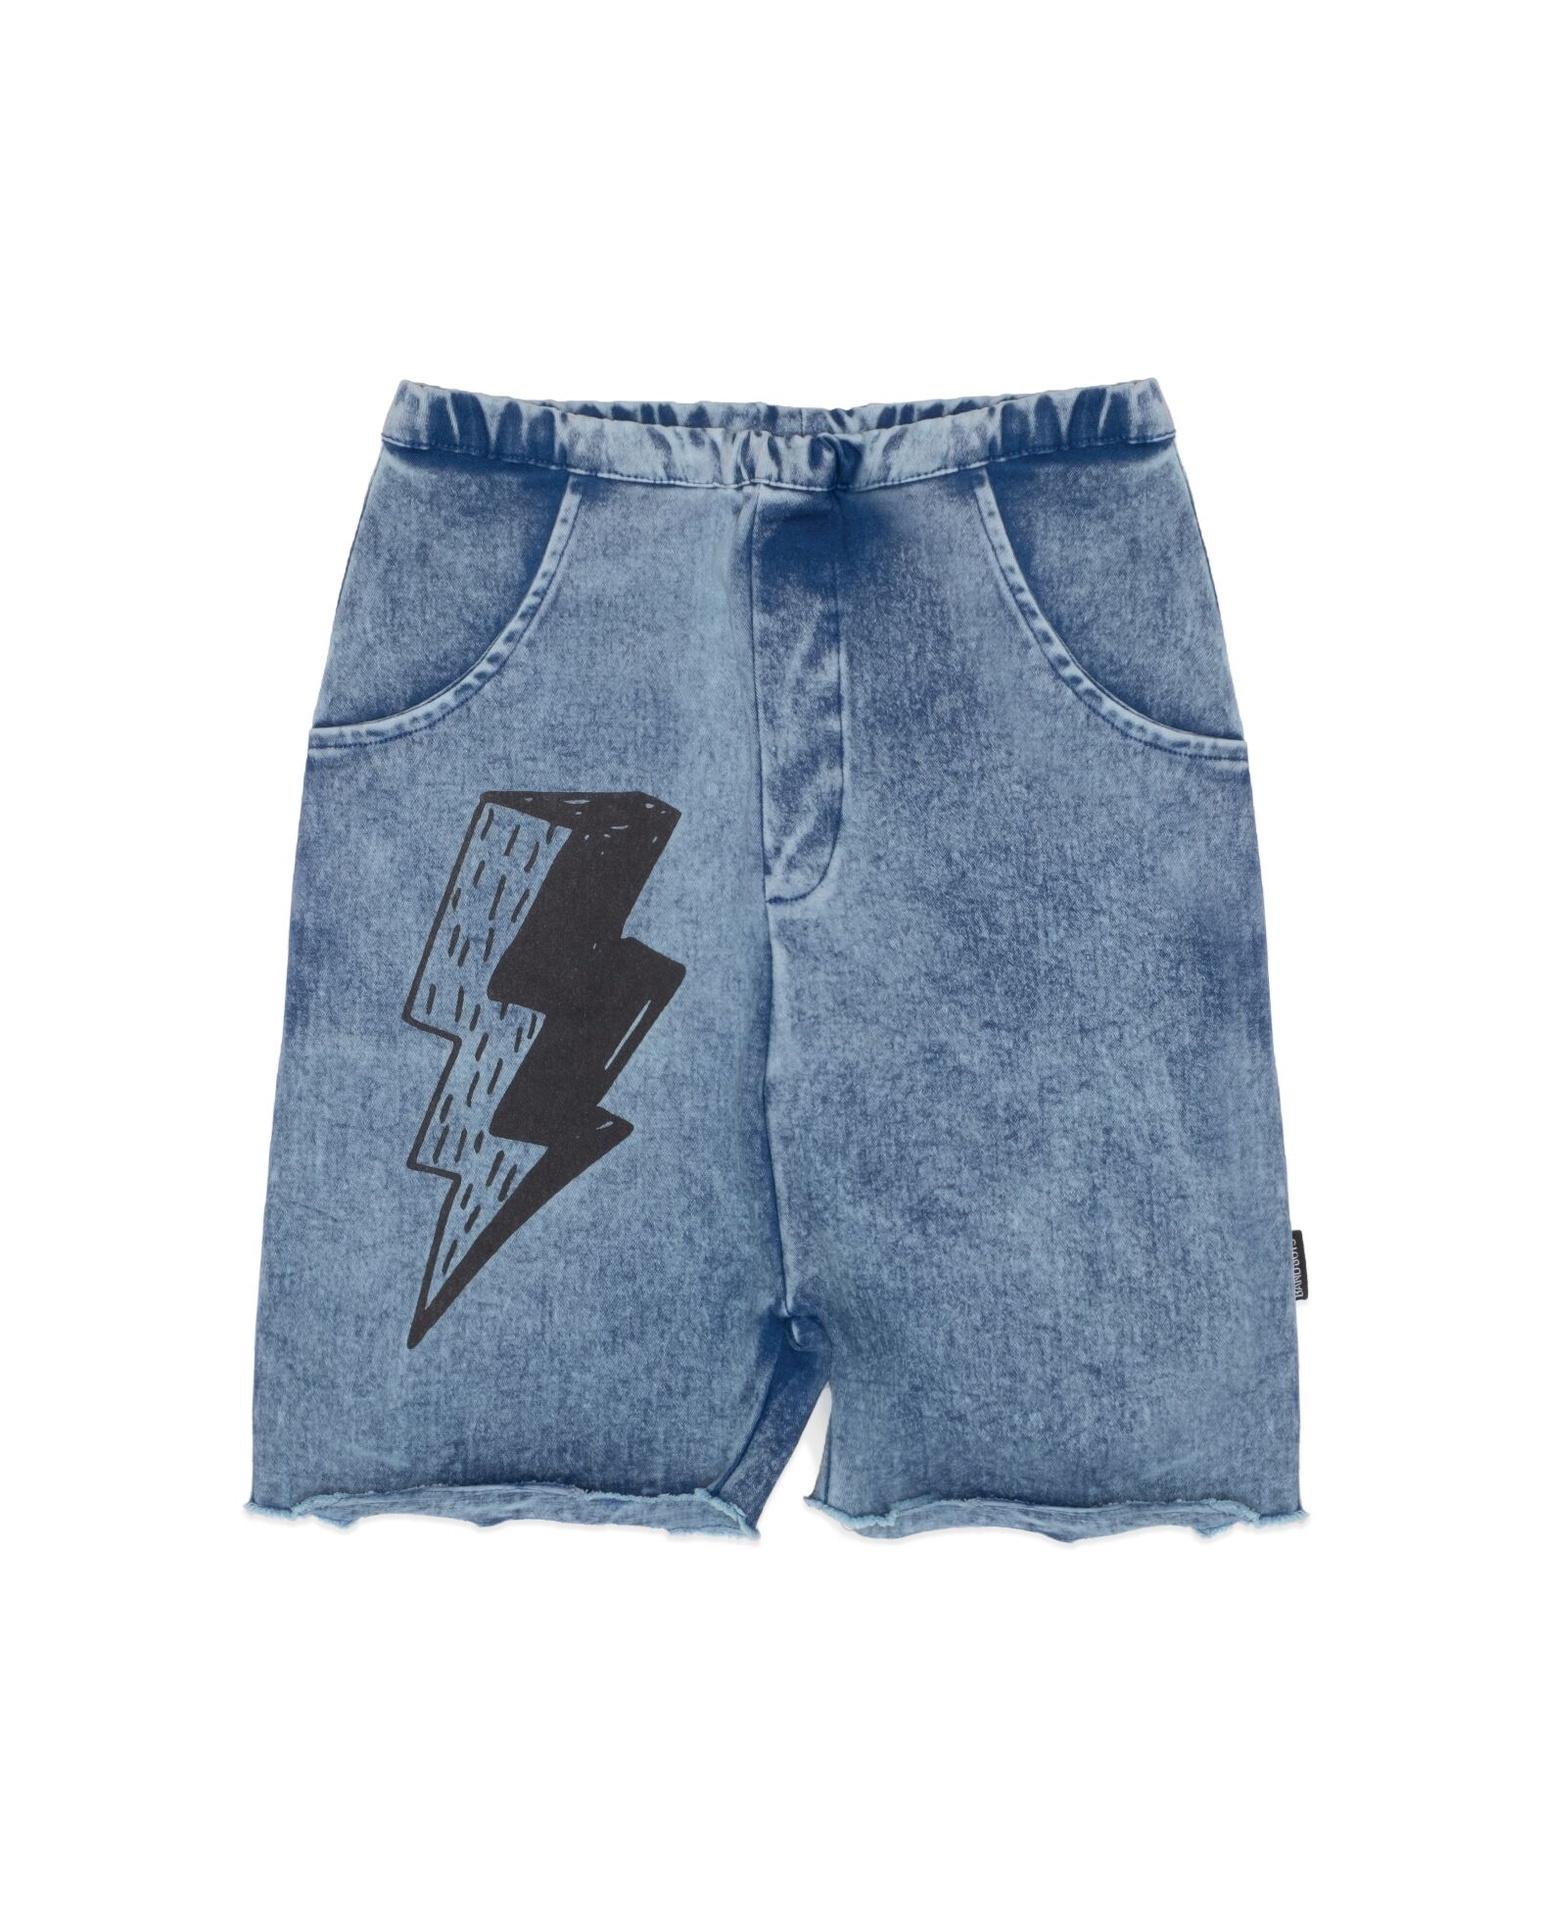 BOB Lightening Vintage Blue Denim Shorts